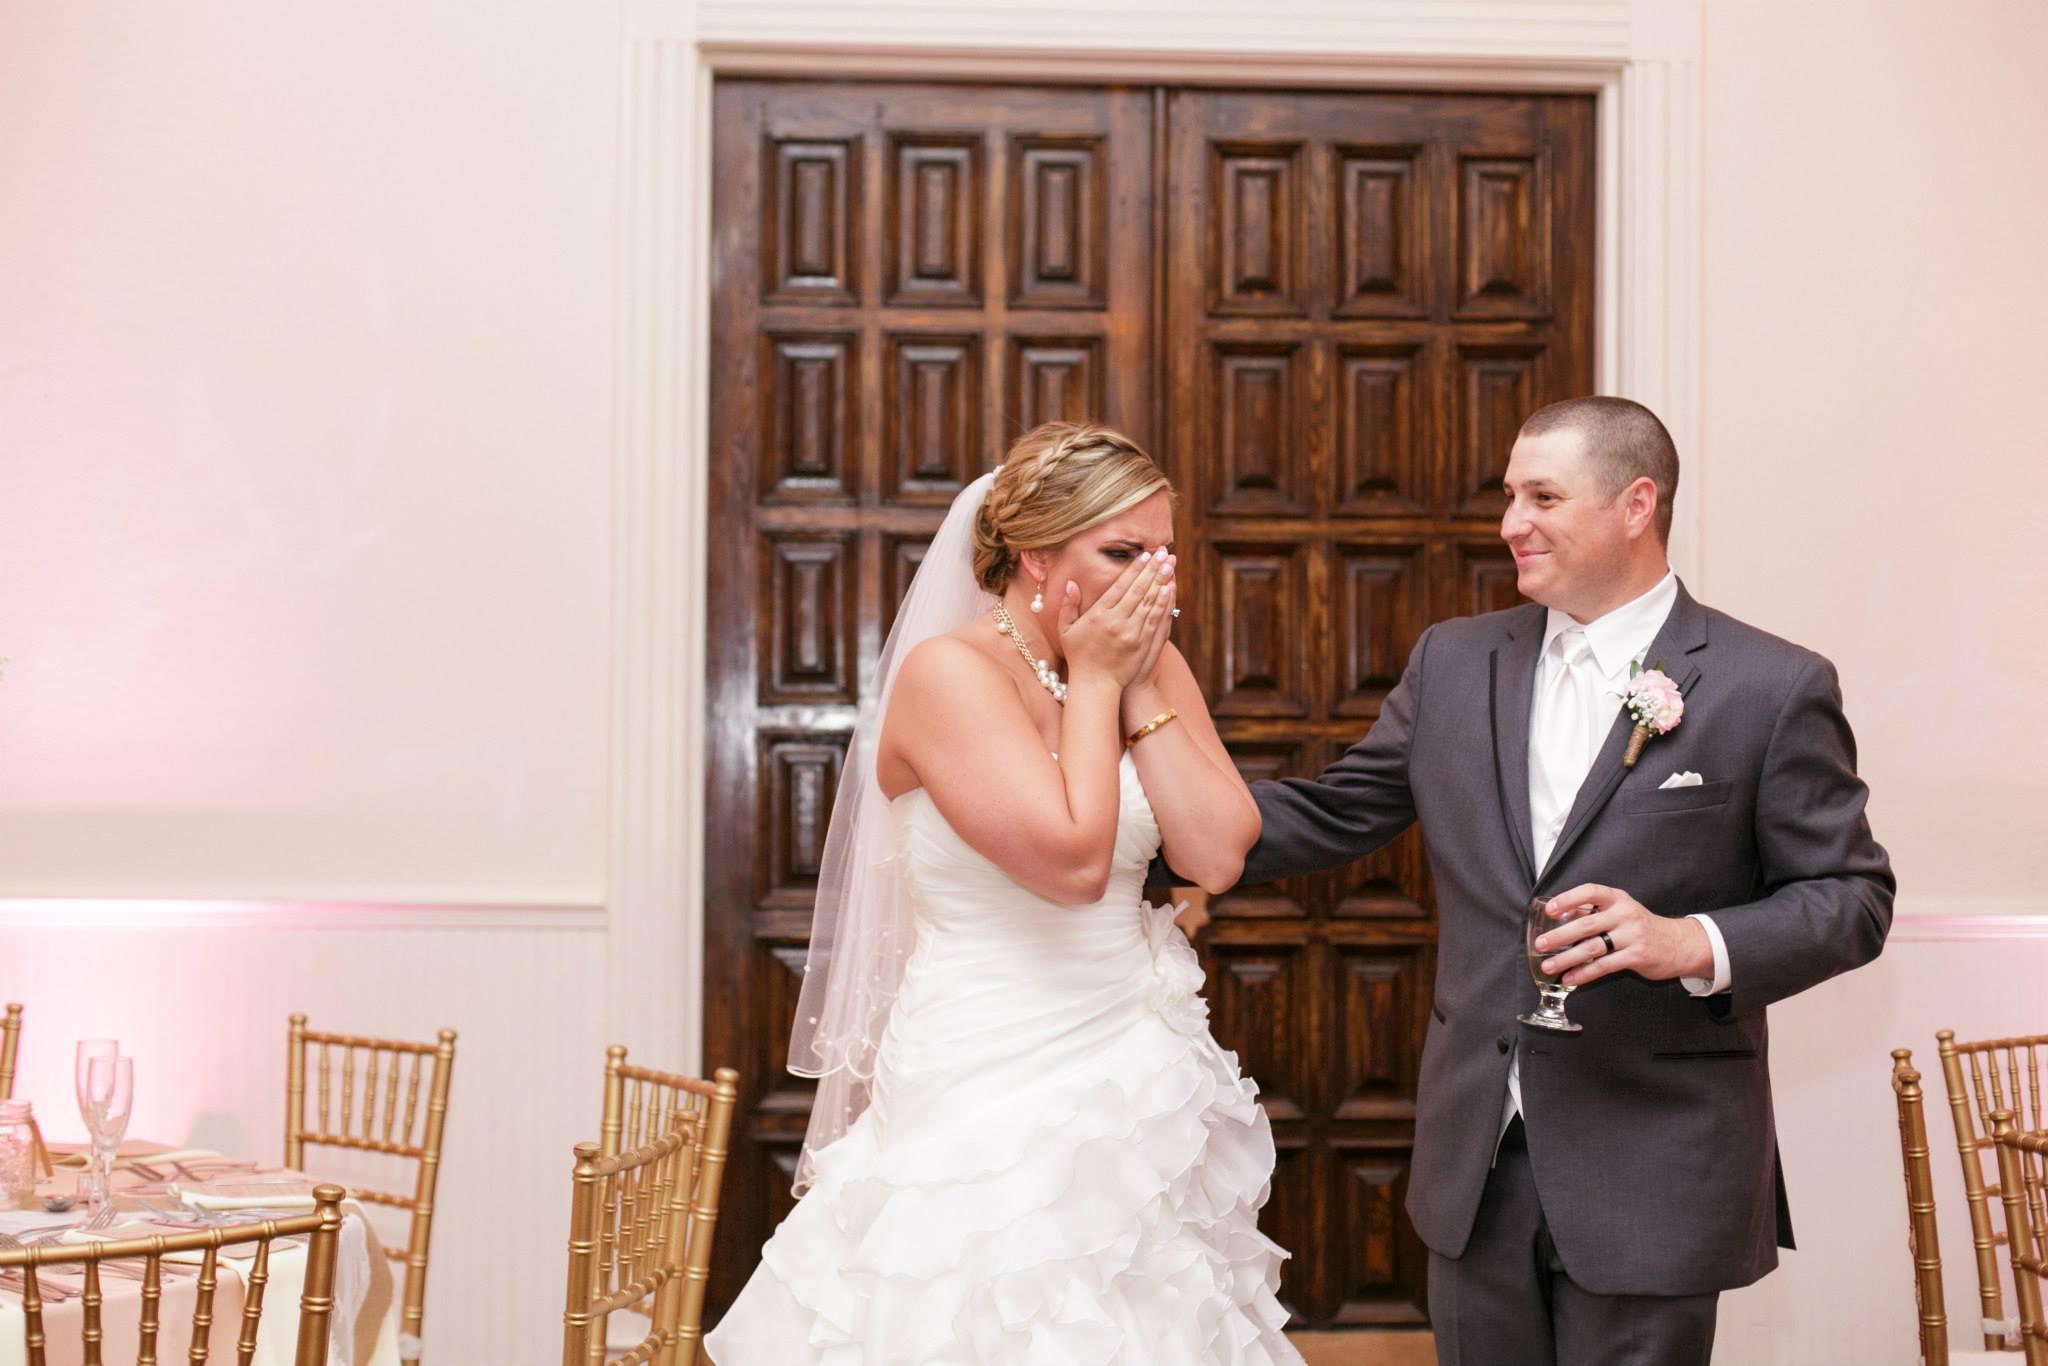 Rustic Chic Romantic Wedding at Highland Wedding – Blush Pink Uplighting